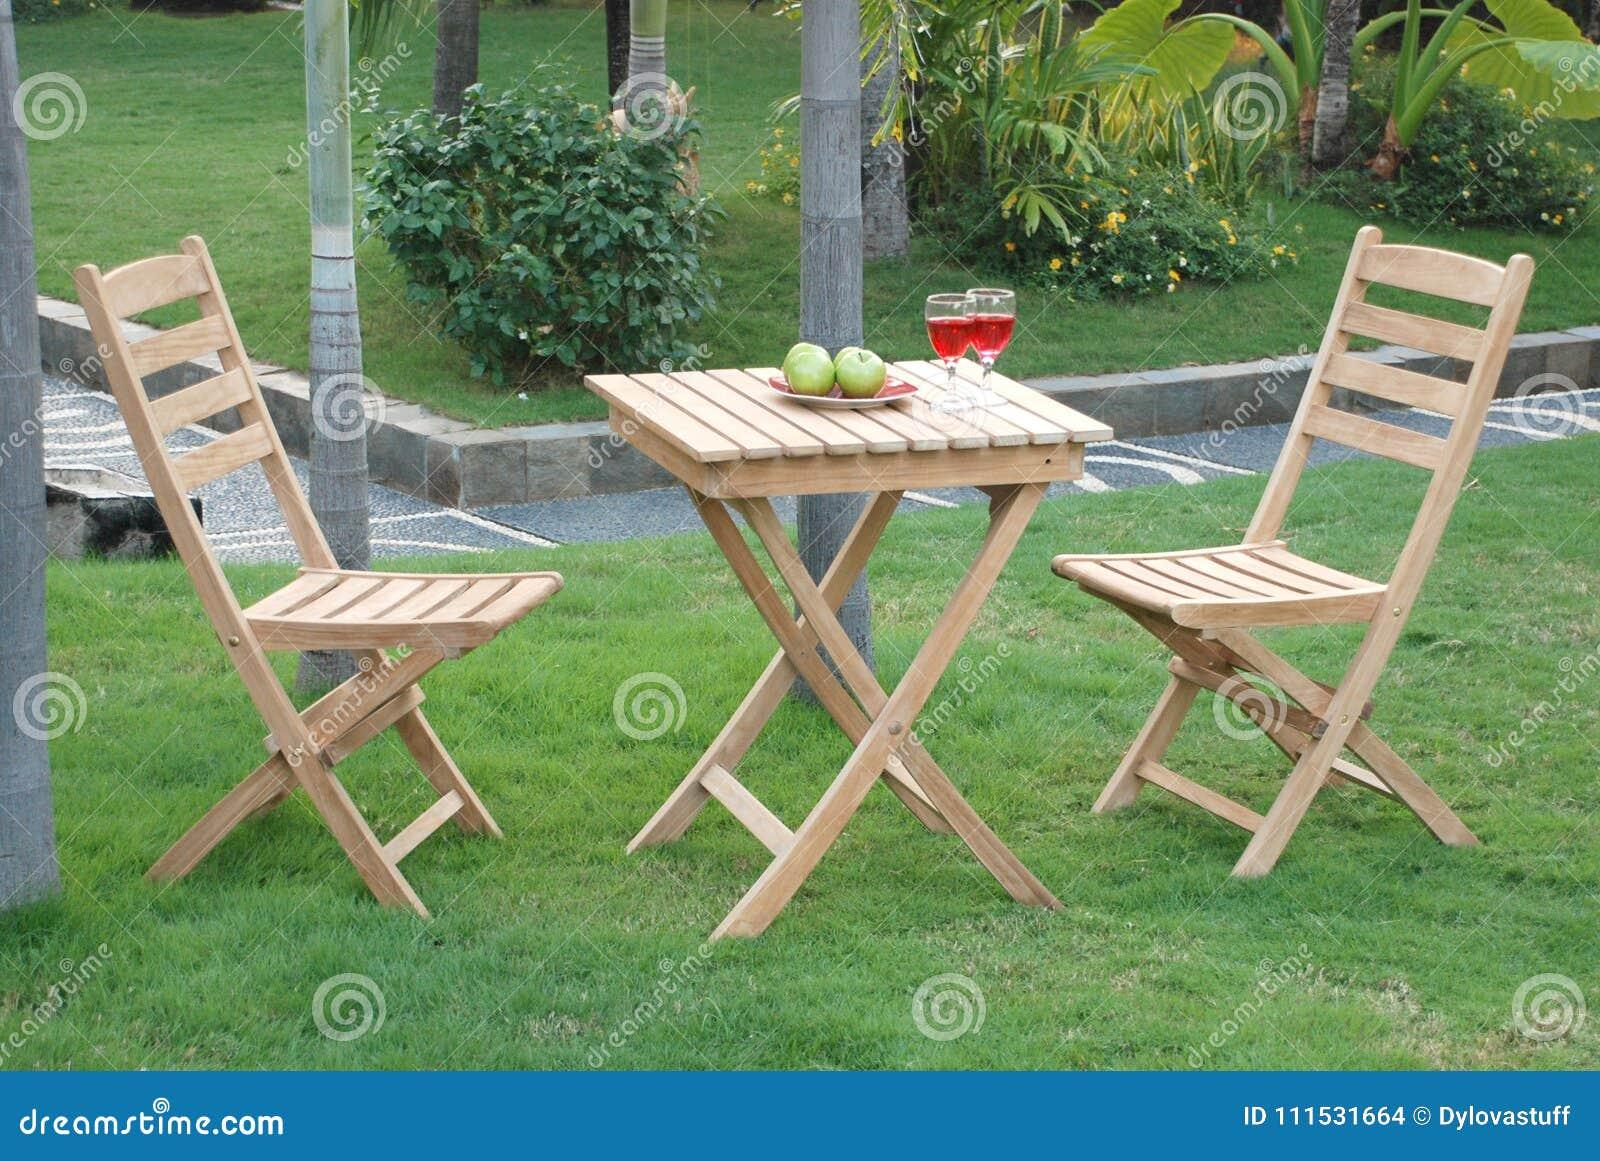 Super Teak Garden Furniture Out Door Teak Garden Stock Photo Ocoug Best Dining Table And Chair Ideas Images Ocougorg